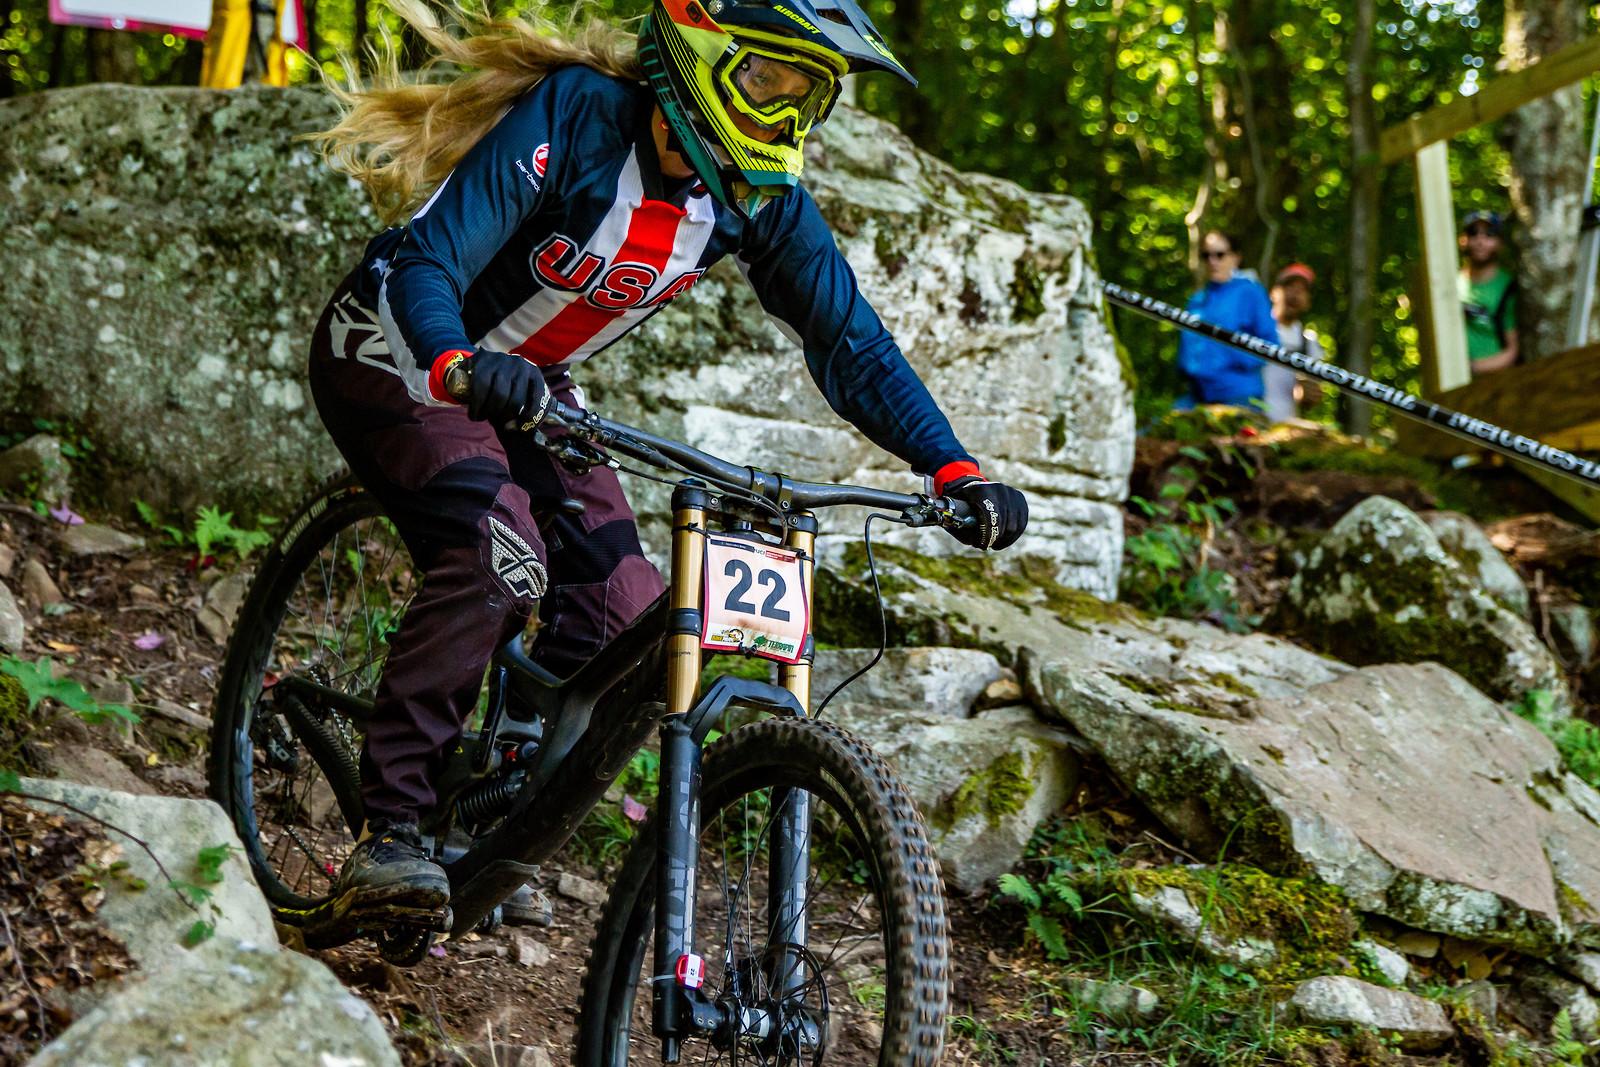 Riley Weidman - JackRice - Mountain Biking Pictures - Vital MTB